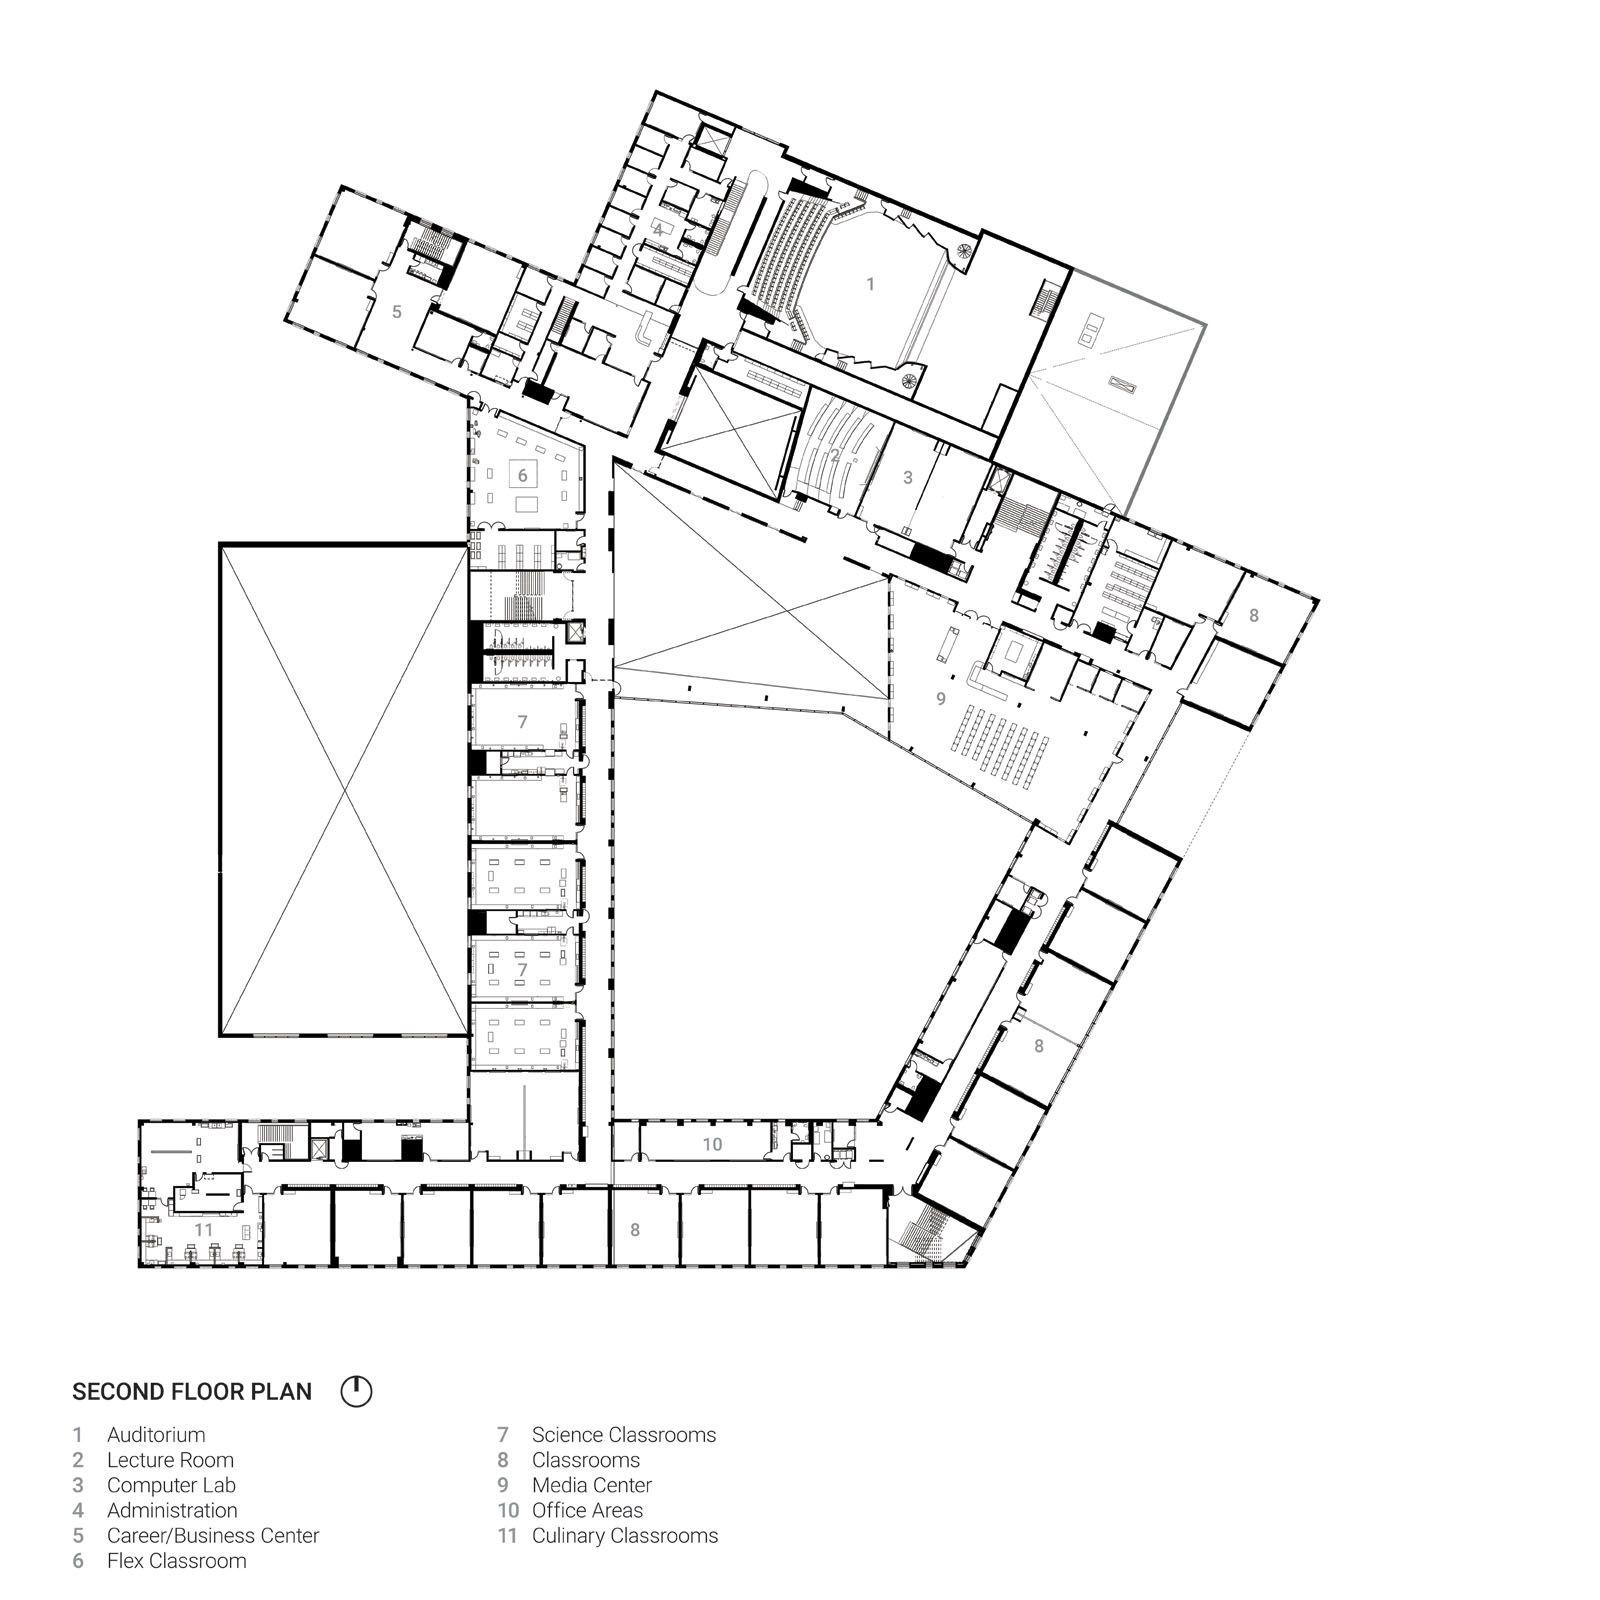 pin by david johnson on precedents floor plans pinterest Lab Room Cartoon learning environments floor plans house floor plans